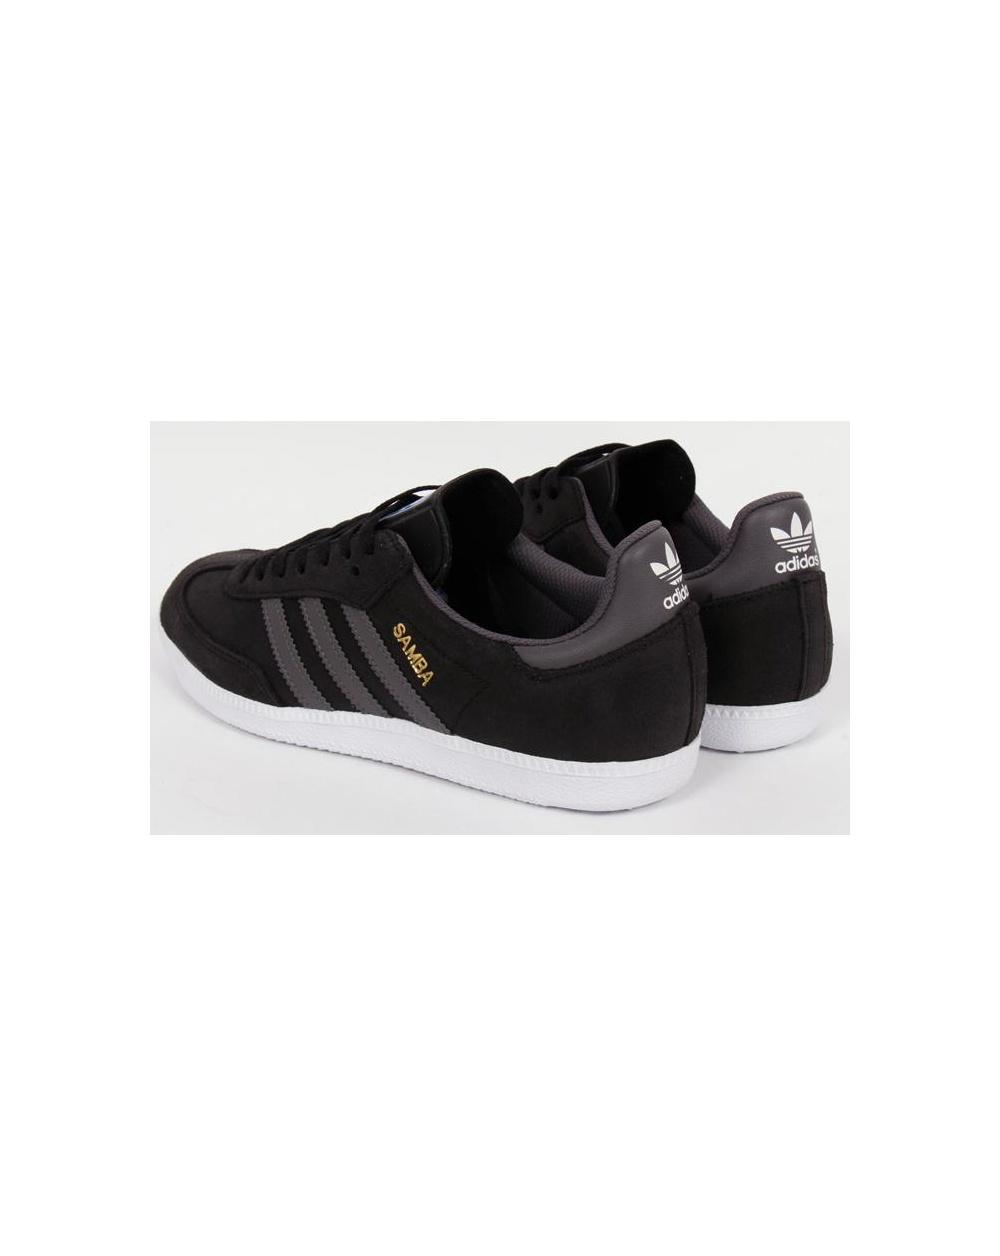 Adidas Samba Brown Golf Shoes